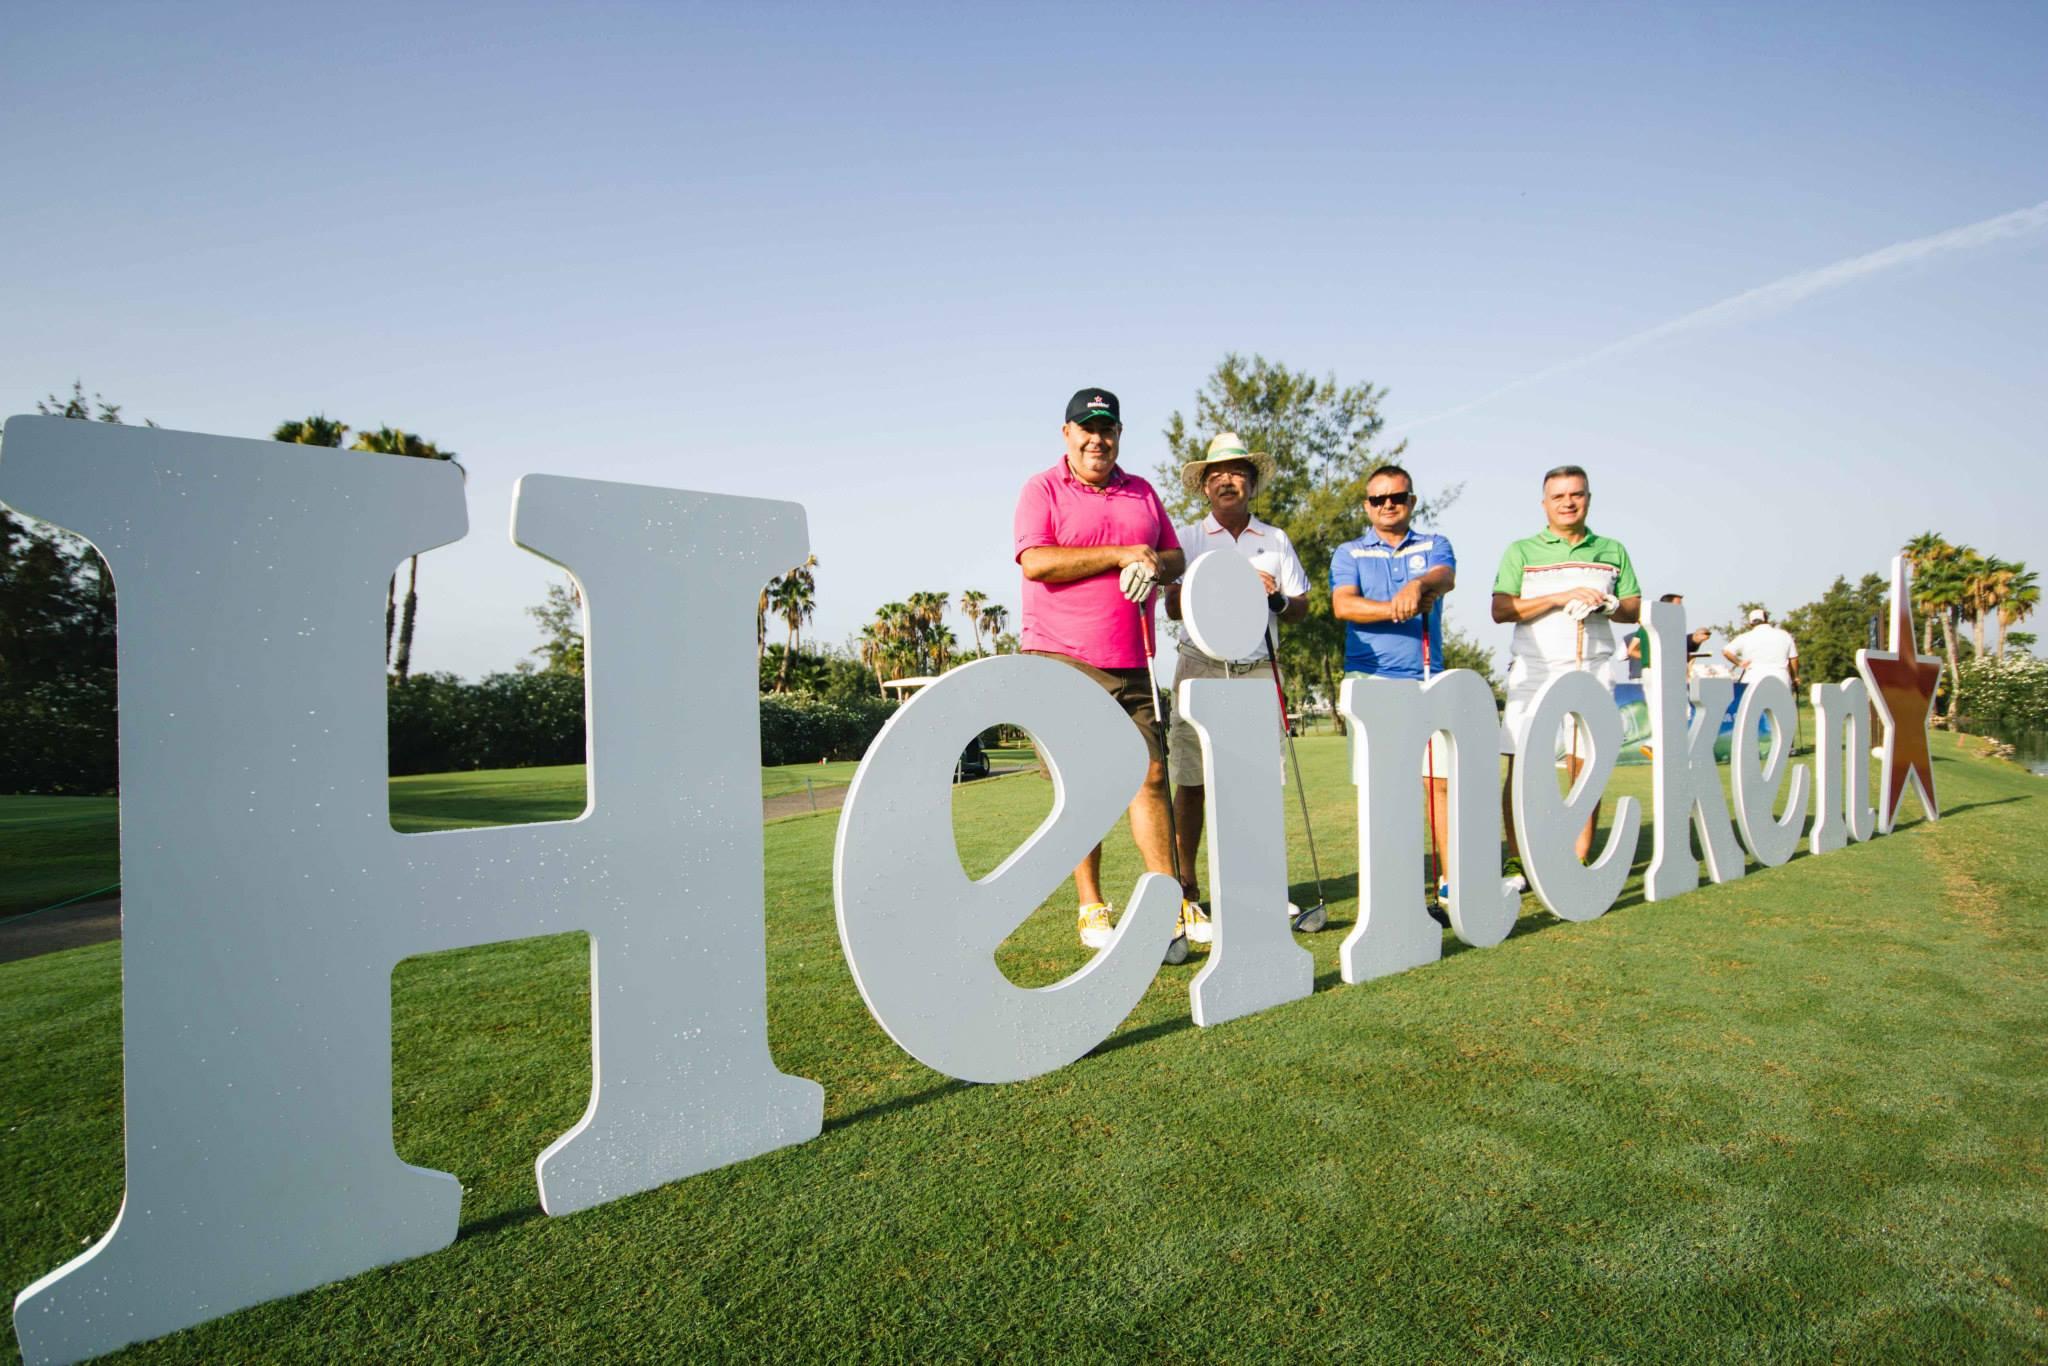 THE OFFICE_golf08.jpg